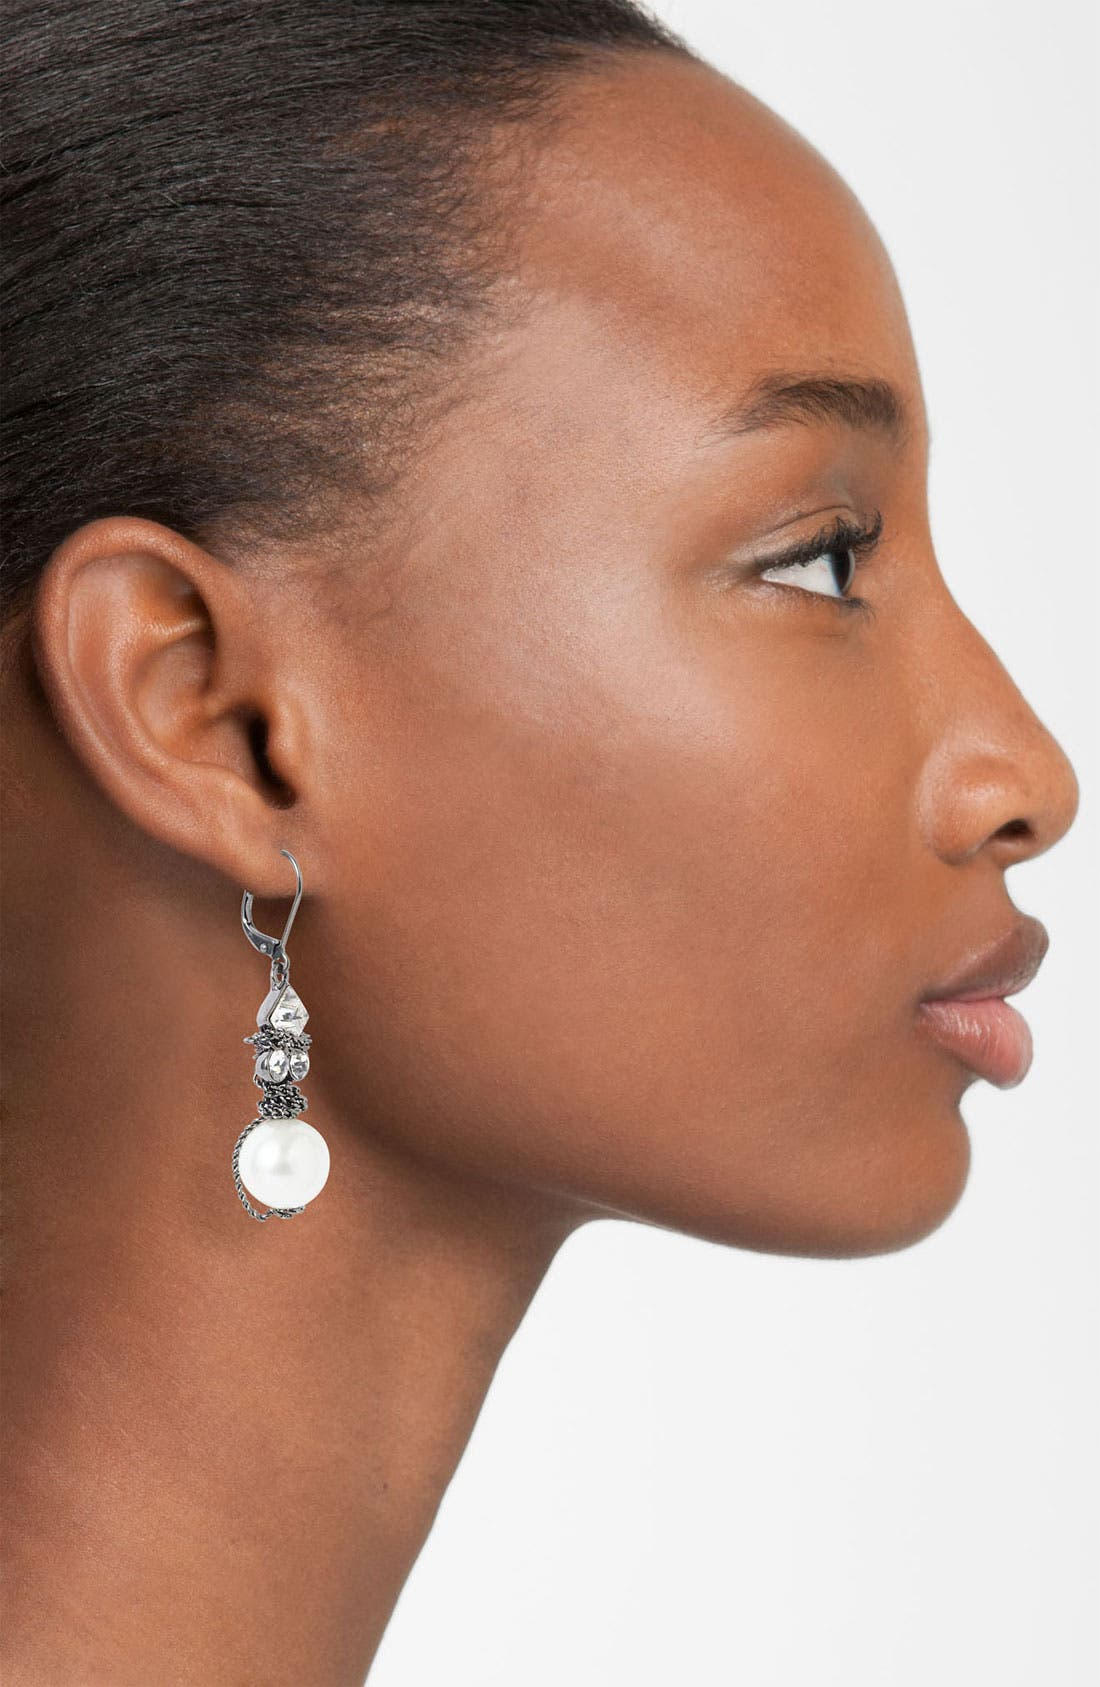 Small Glass Pearl Earrings,                             Alternate thumbnail 2, color,                             020